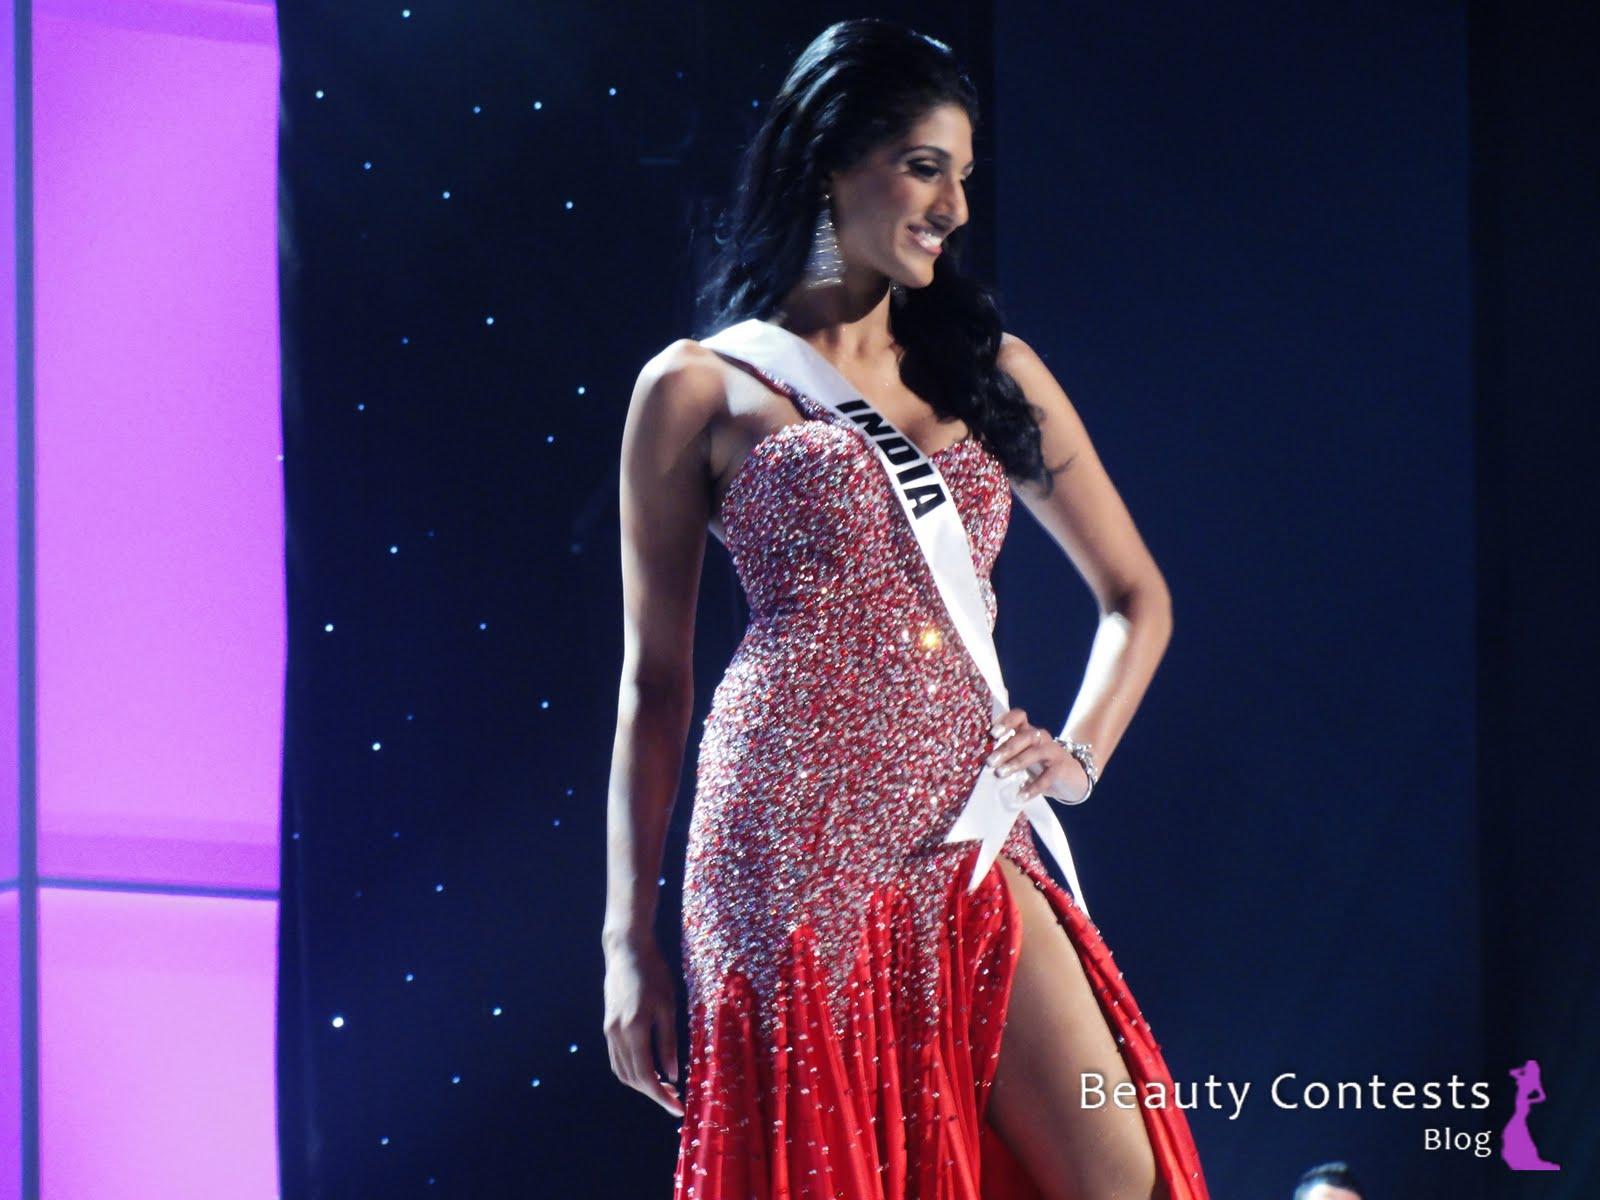 Miss Universe Blog